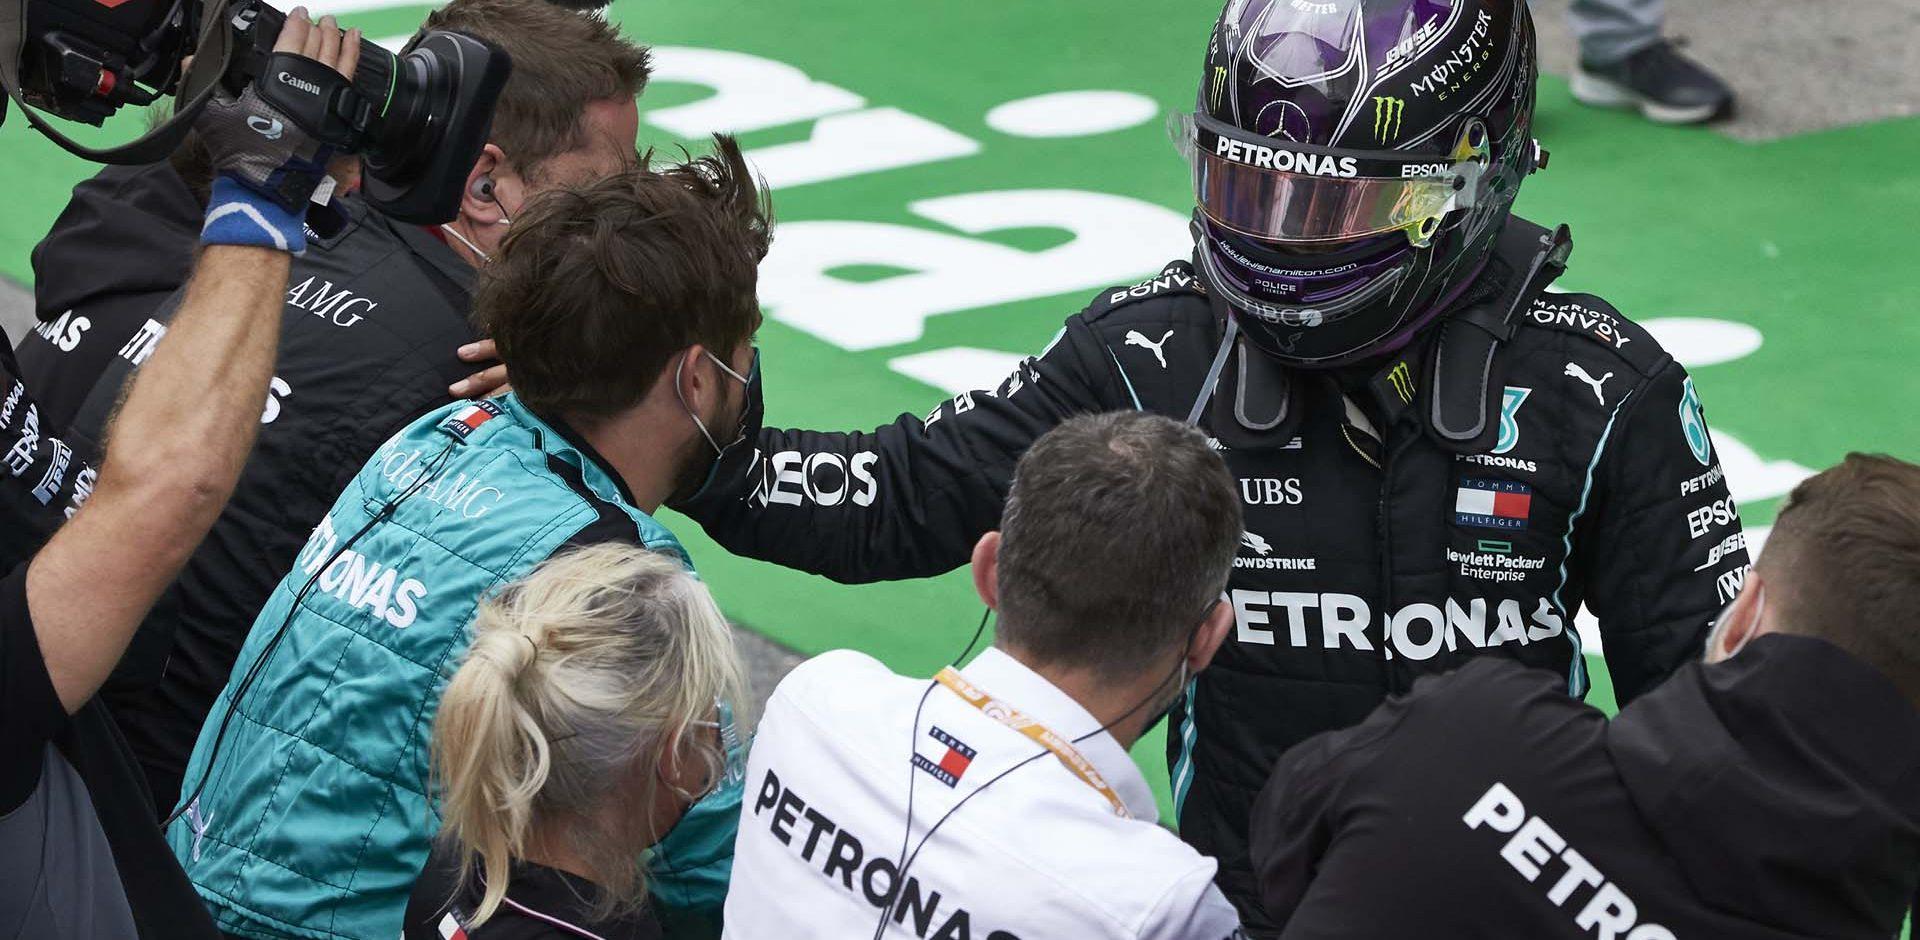 2020 Portuguese Grand Prix, Sunday - Steve Etherington Lewis Hamilton Mercedes